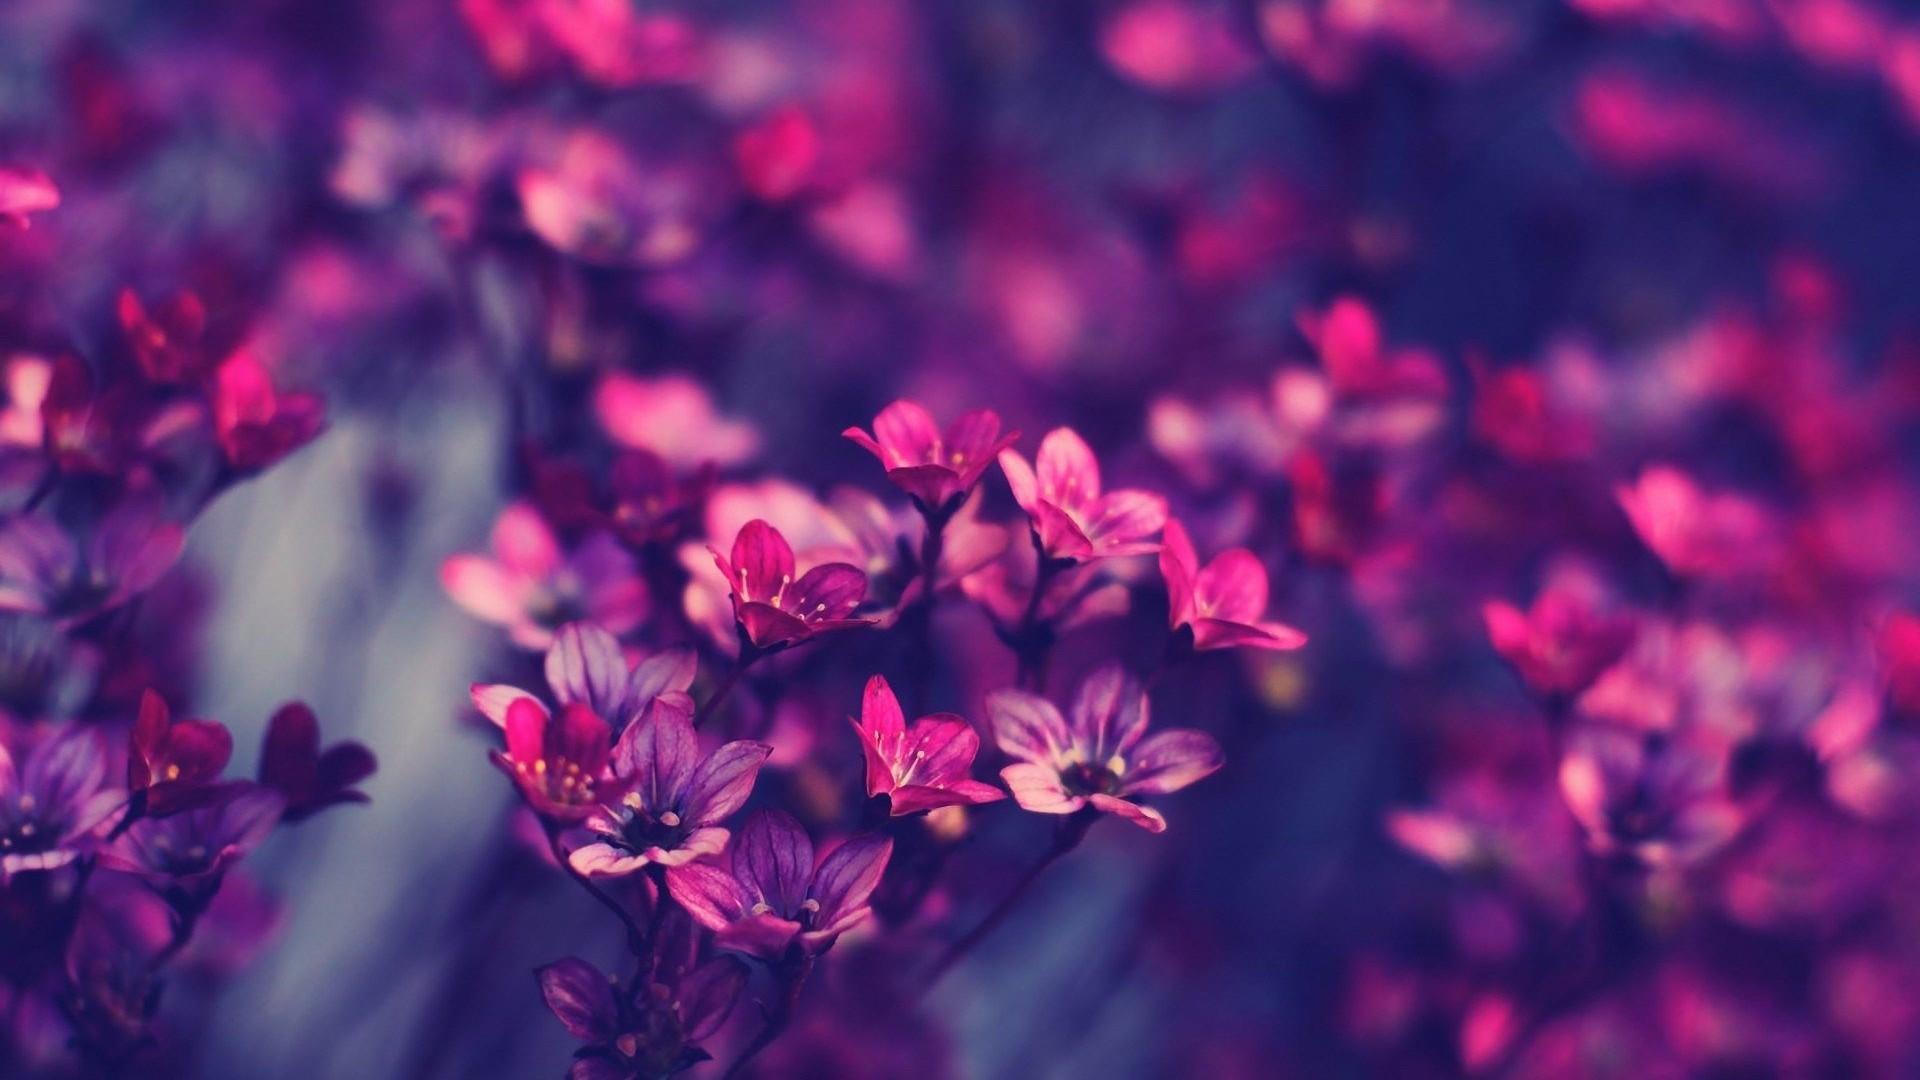 Fotos de flores para salvapantallas 84